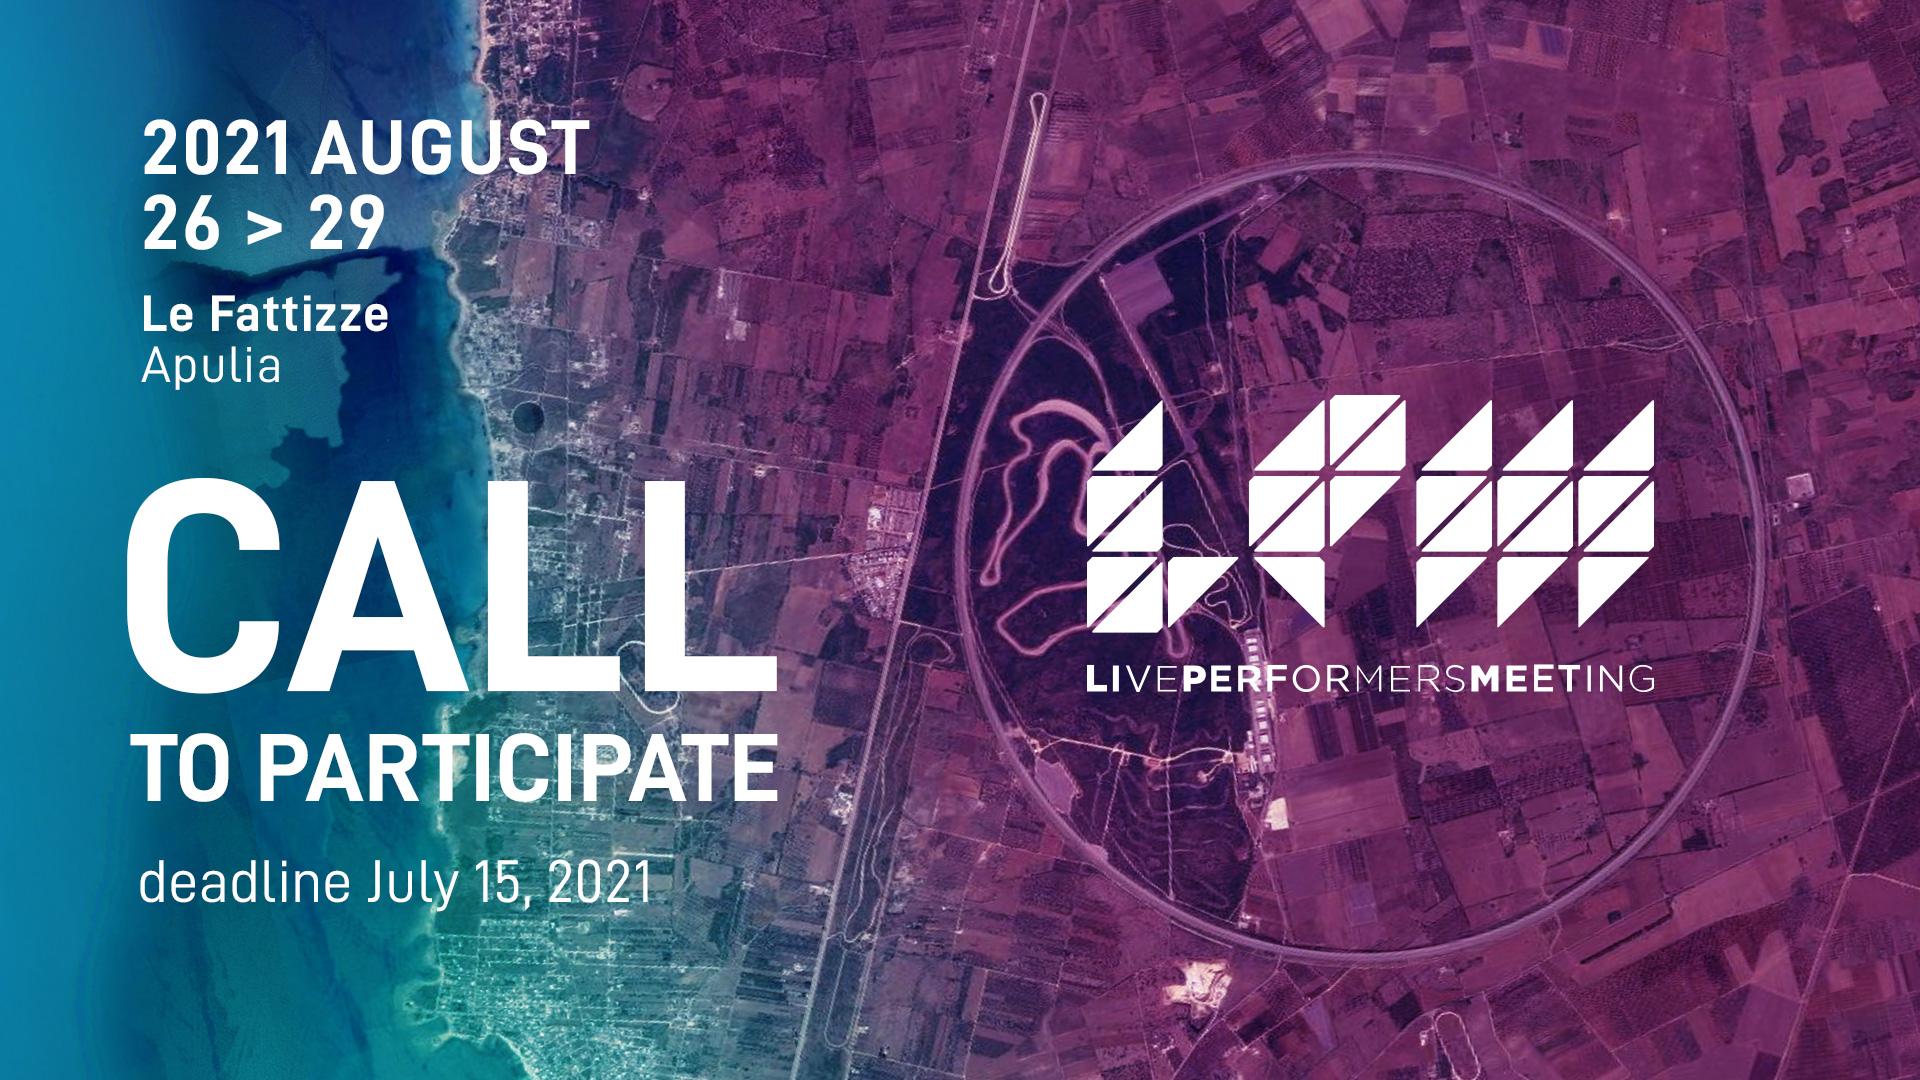 Image for: LPM 2021 Apulia | CALL TO PARTICIPATE